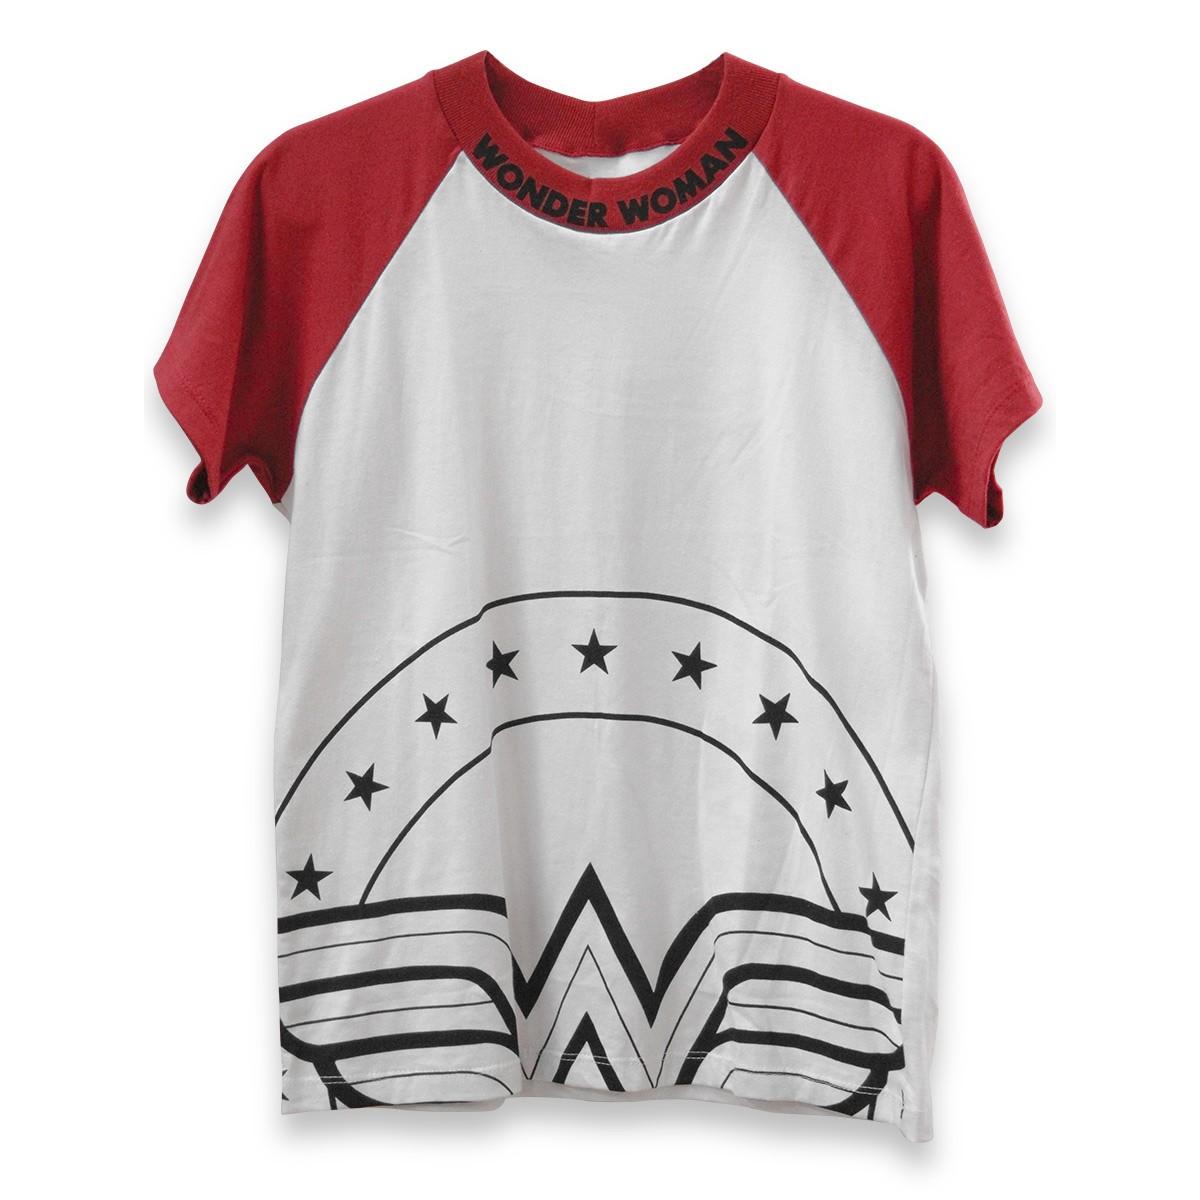 Camiseta Raglan Feminina Mulher Maravilha Retrô Red